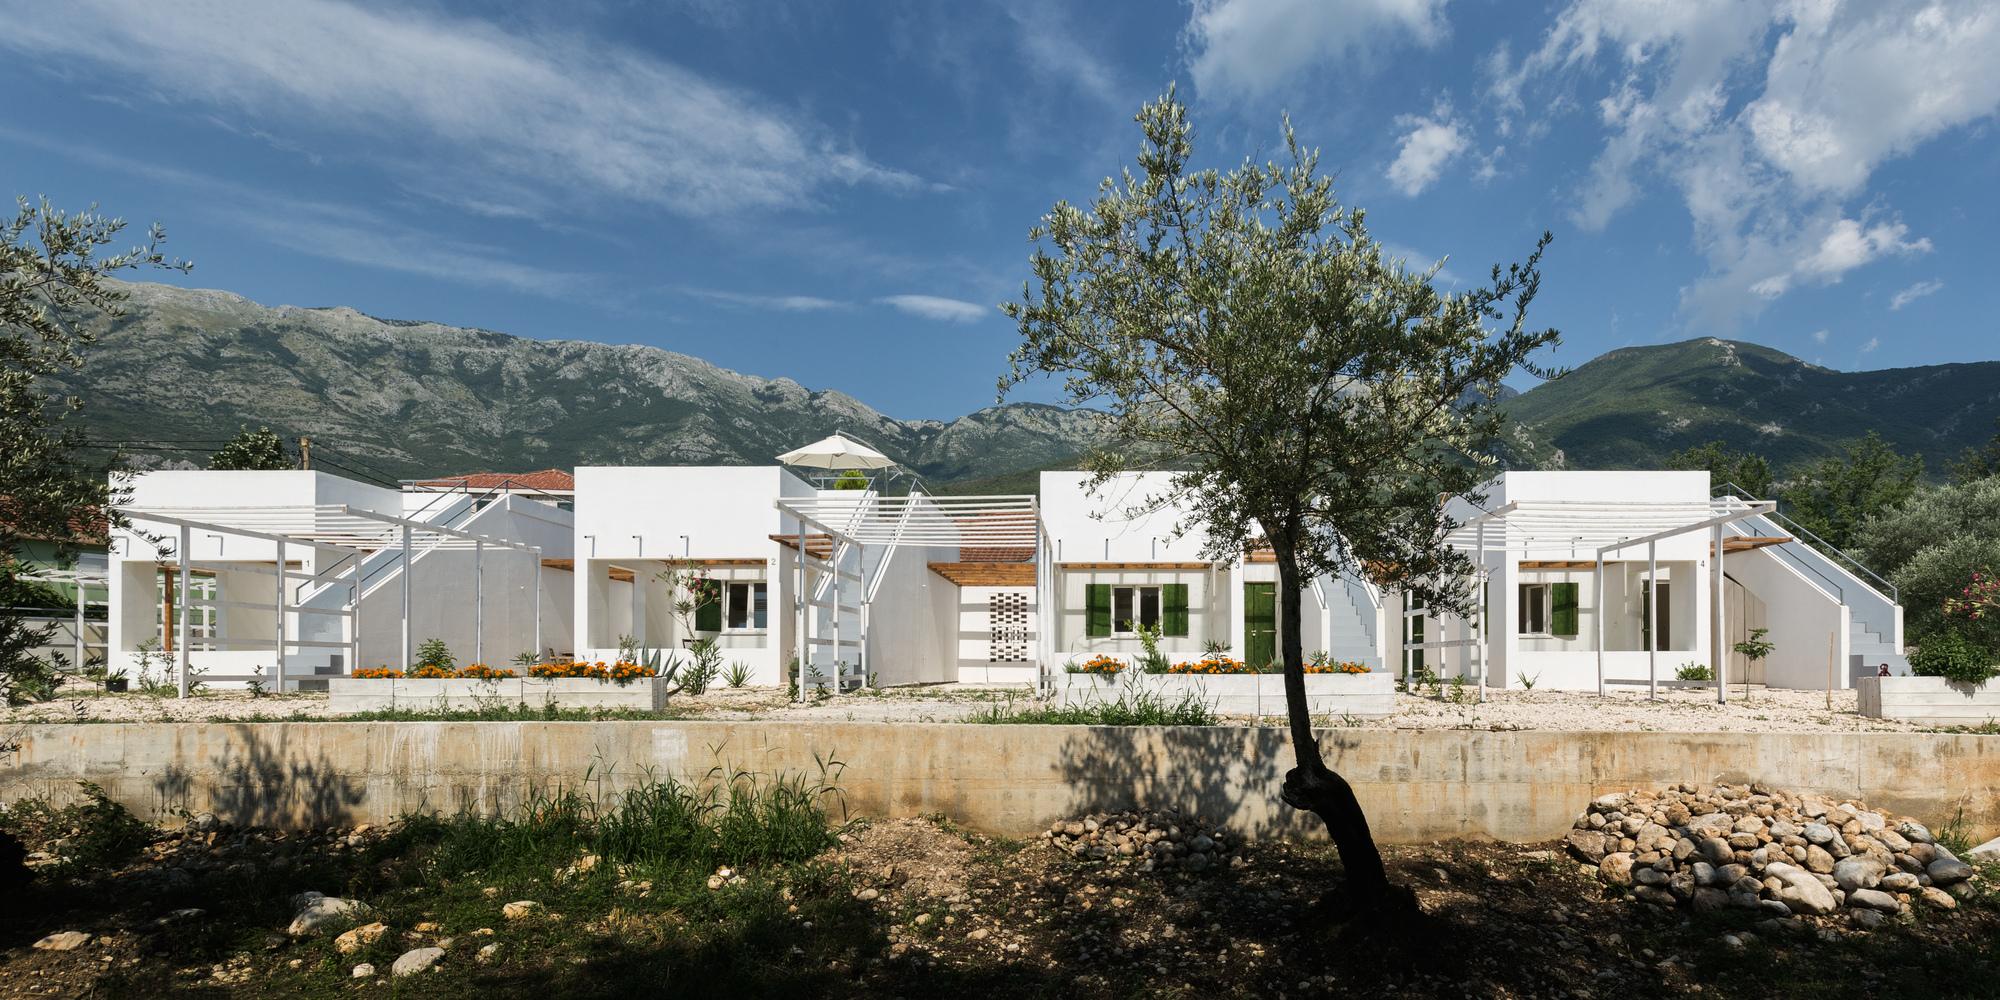 Summer Houses / AKVS architecture